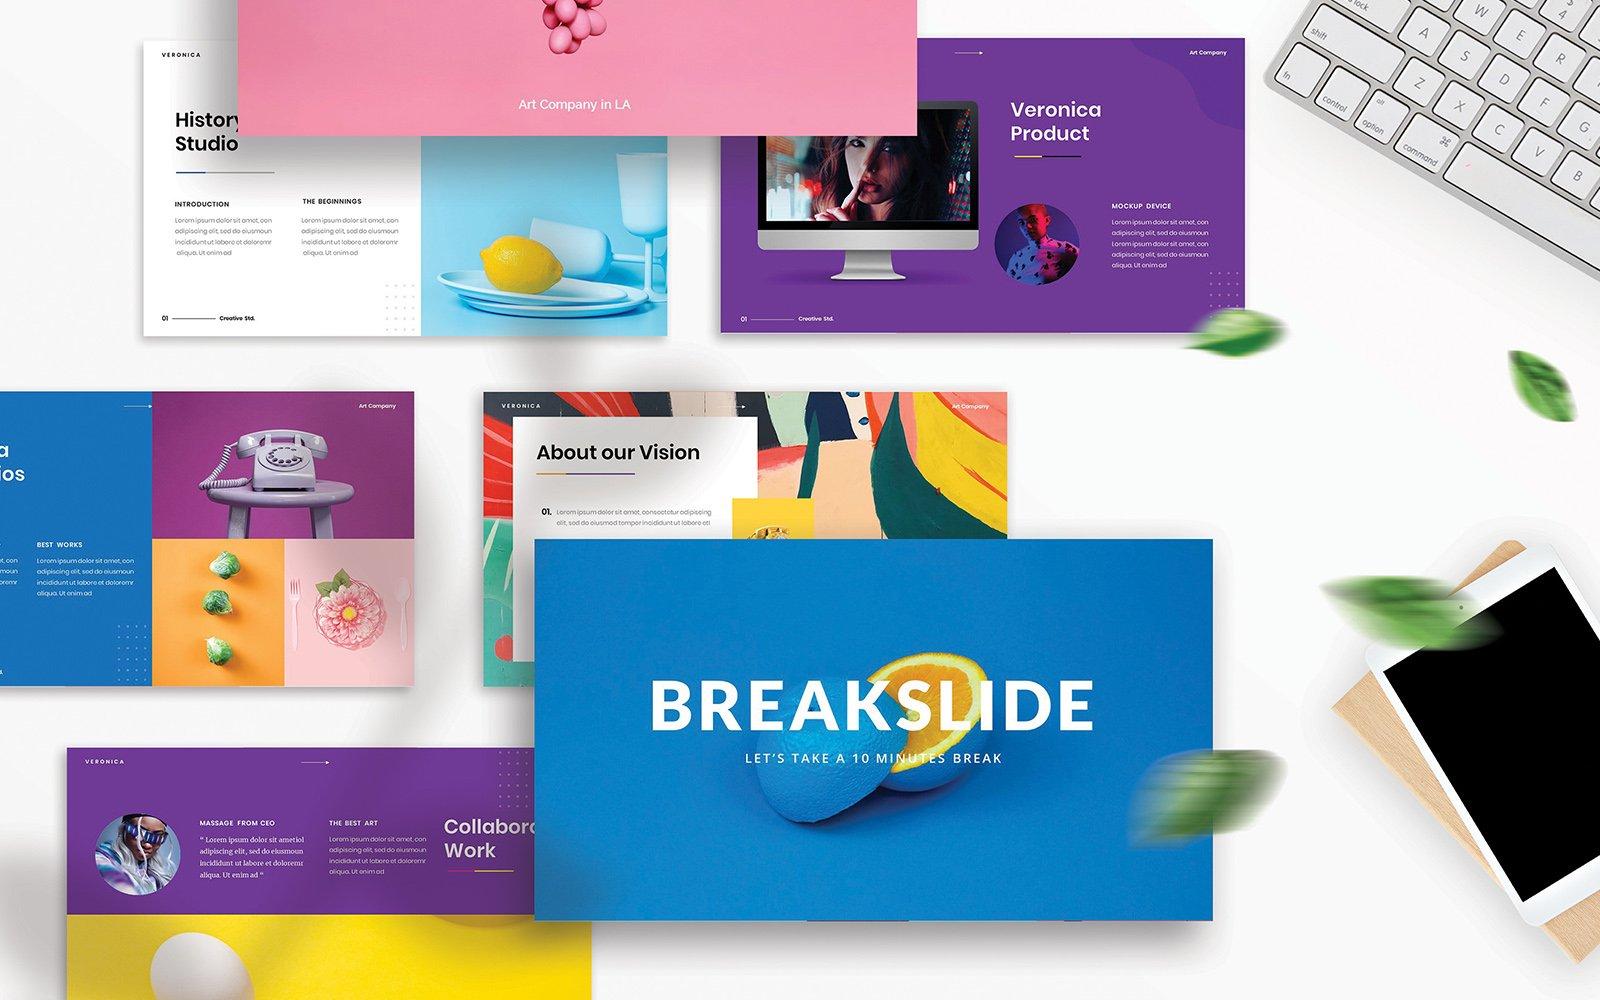 Szablon PowerPoint Veronica – Creative Business #110084